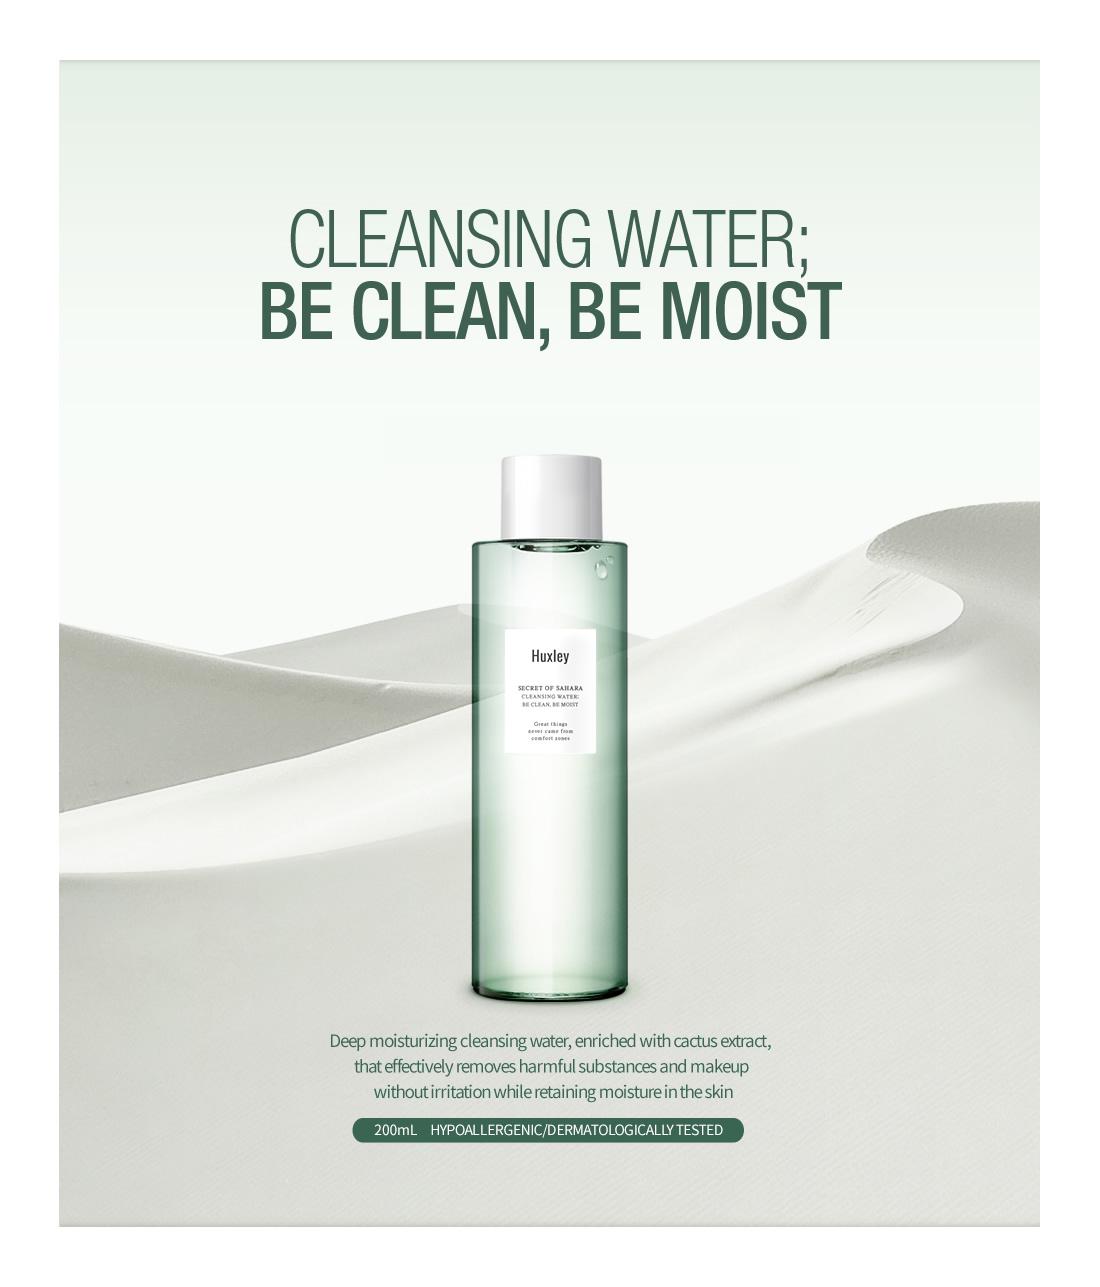 detail-cleansing-water-be-clean-be-moist-1.jpg